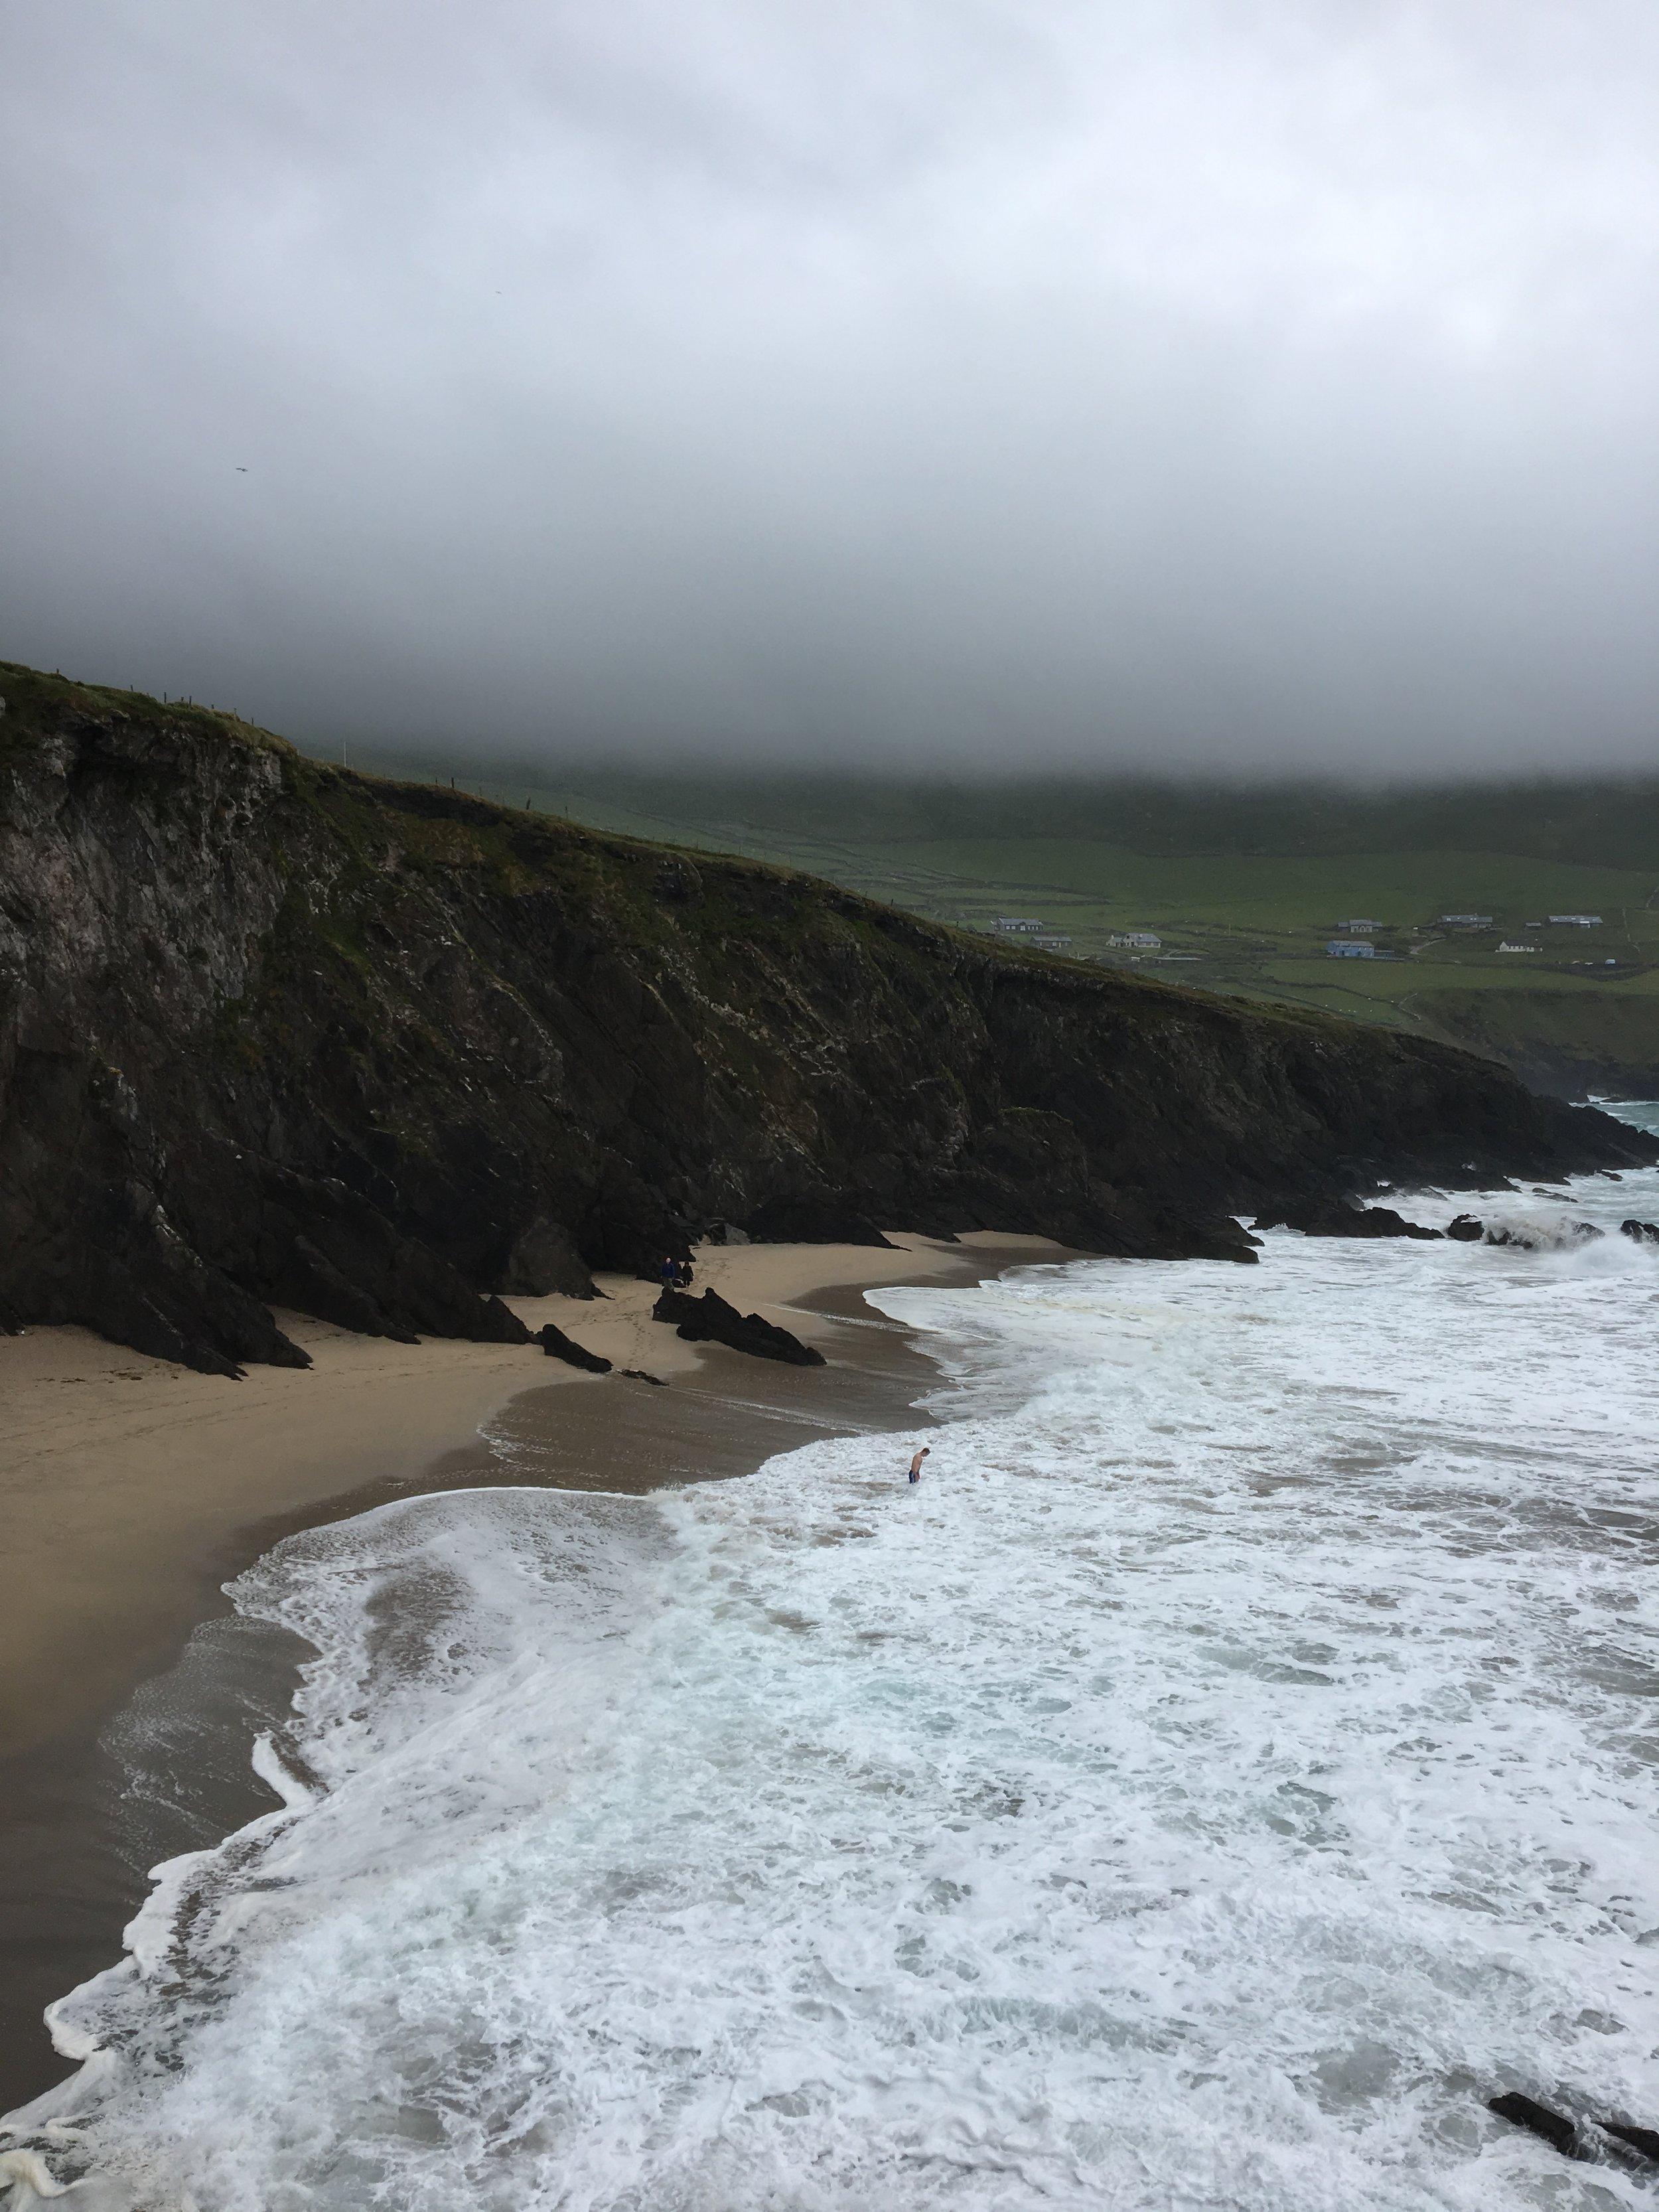 Dingle Peninsula, Ireland - Slea Head Drive - Things to see